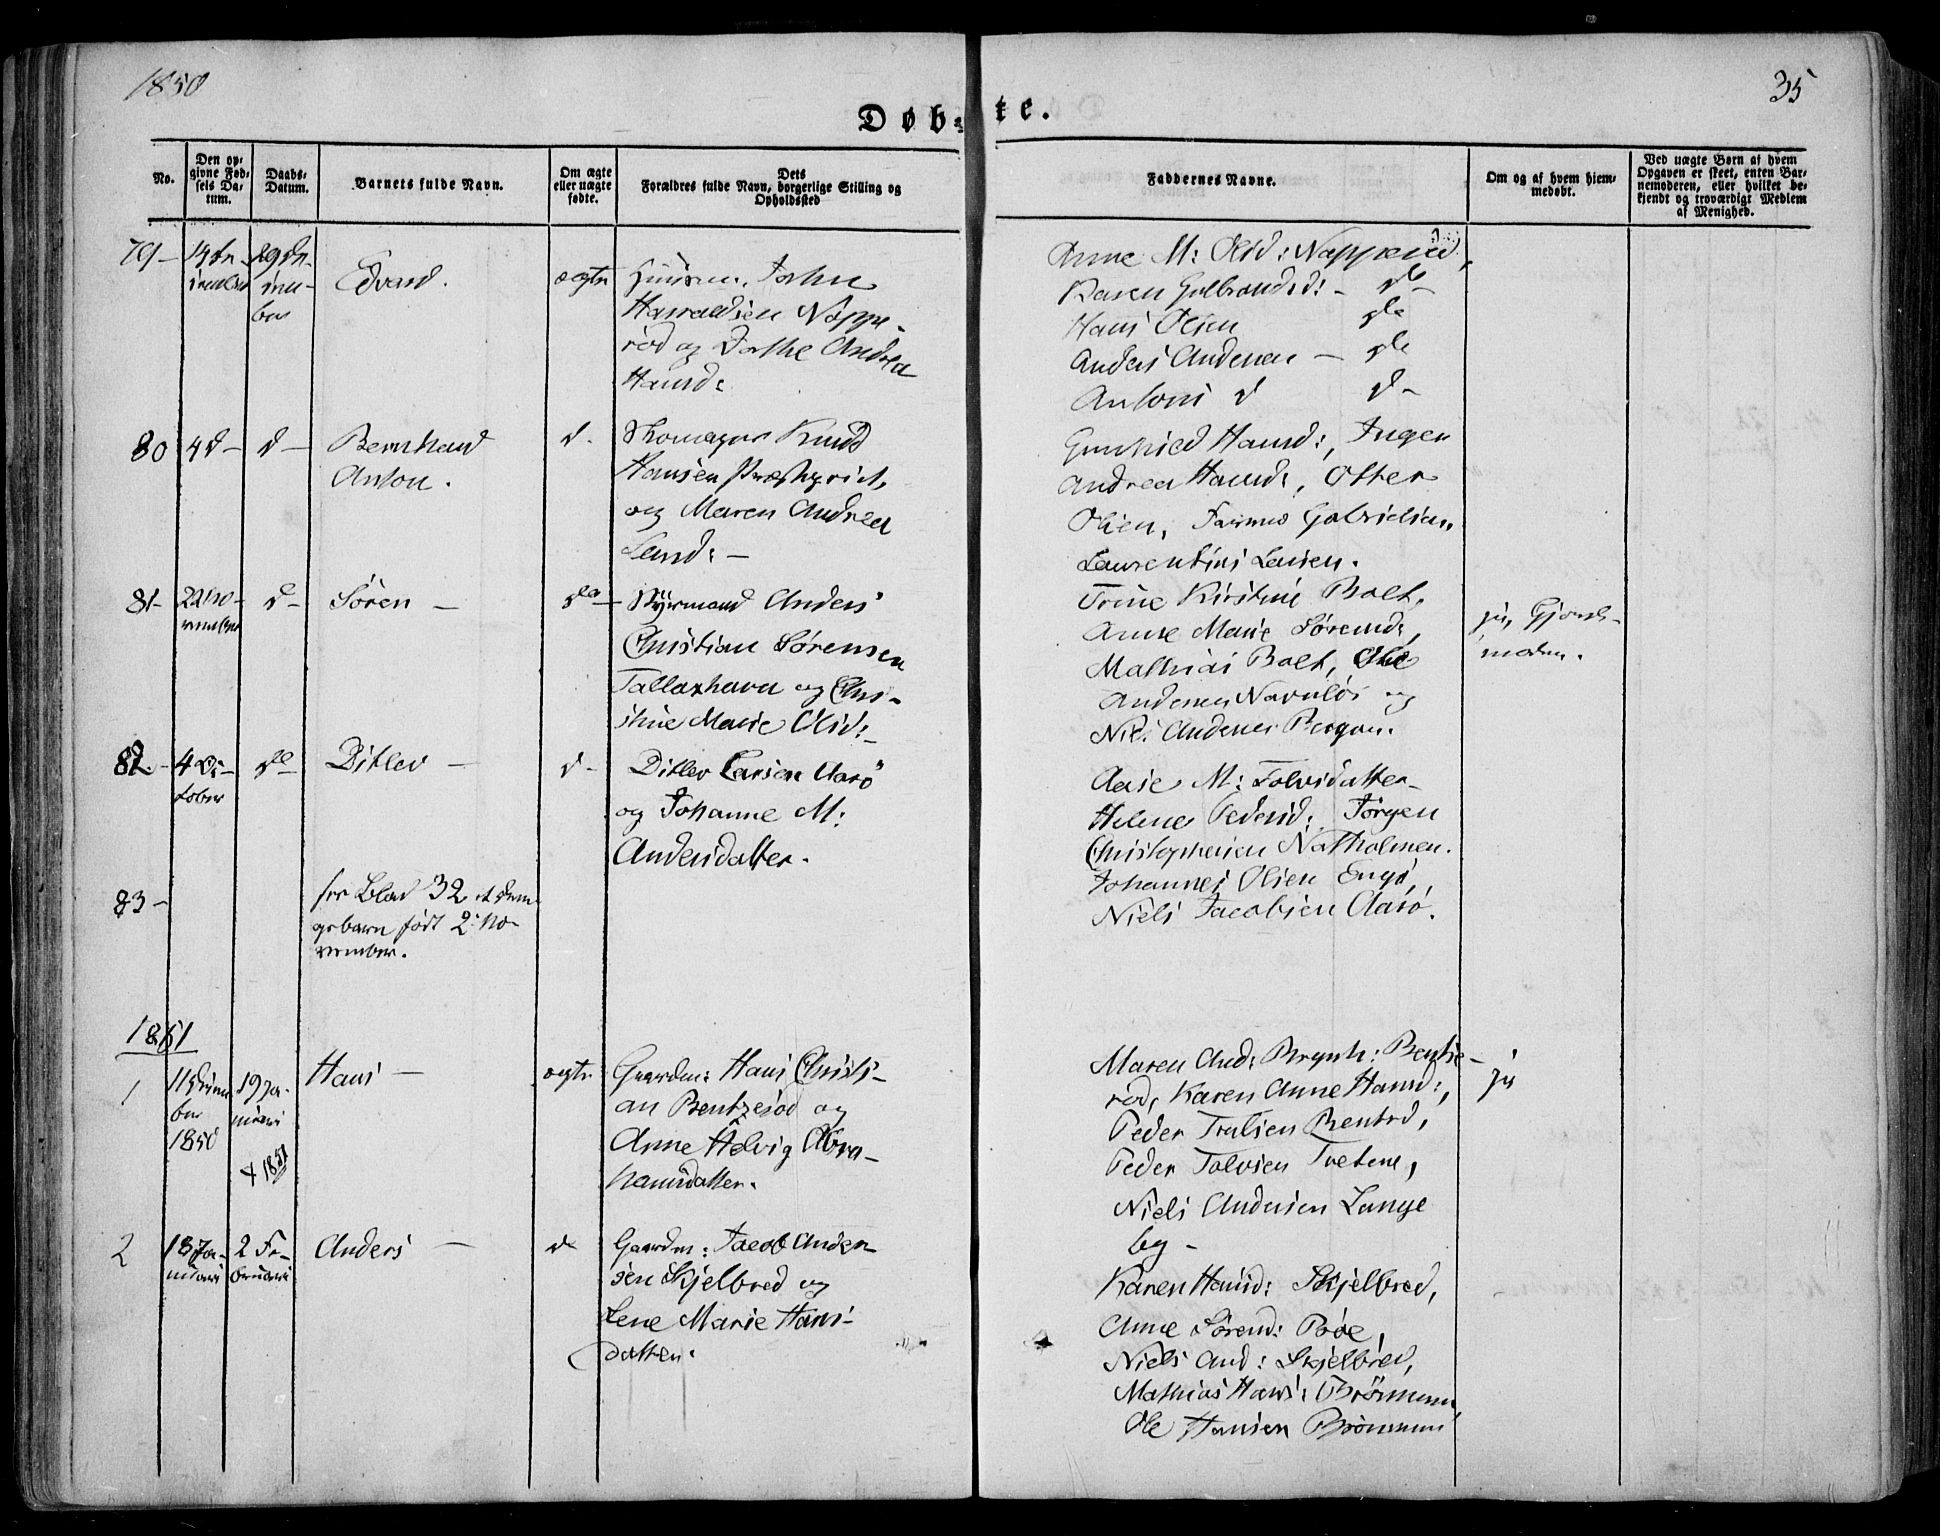 SAKO, Sandar kirkebøker, F/Fa/L0006: Parish register (official) no. 6, 1847-1860, p. 35